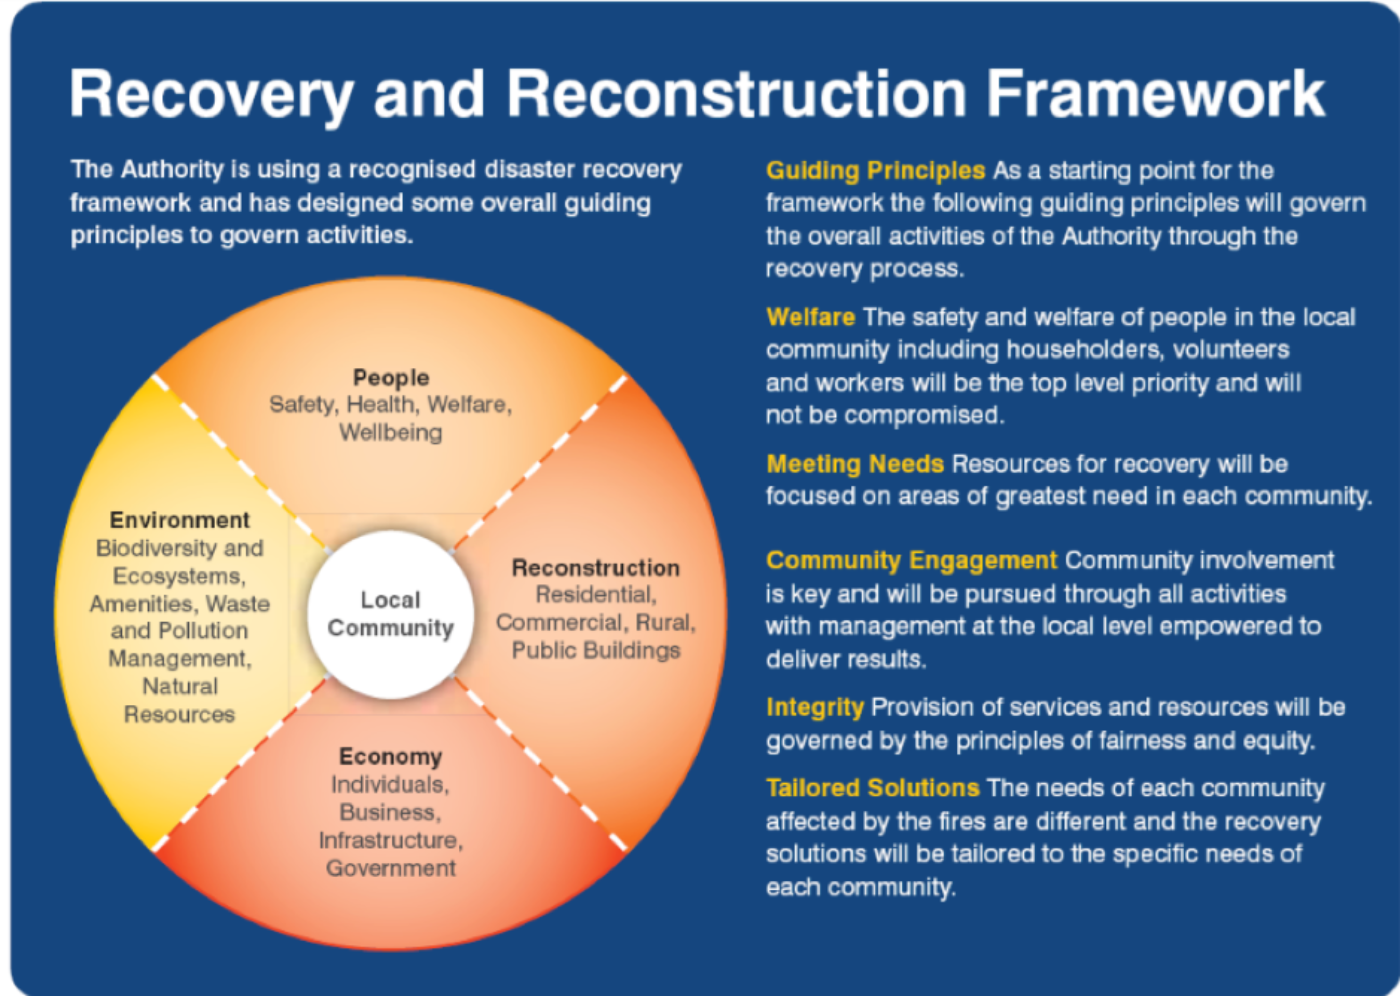 Recov reconstruct framework